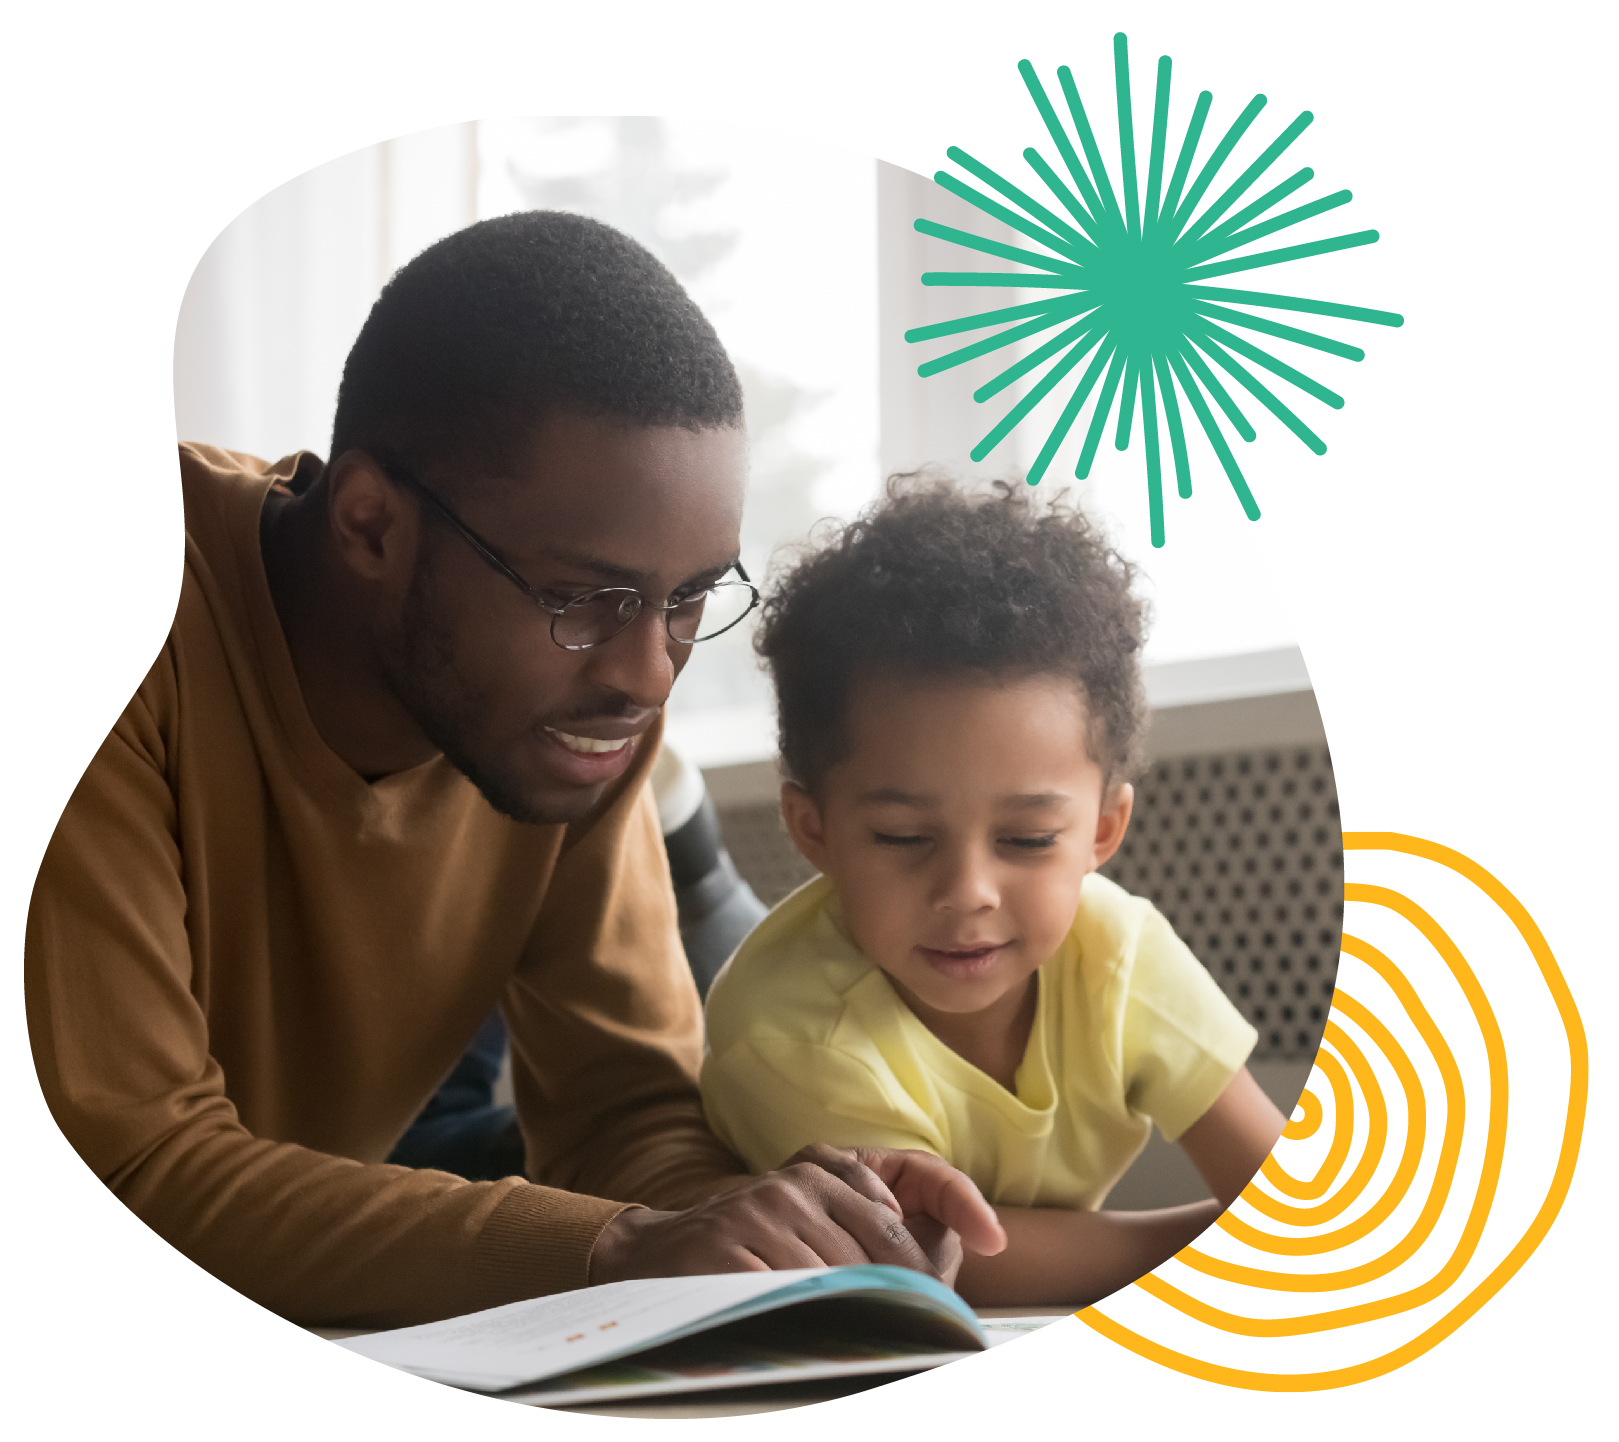 kids-families-literacytips-01